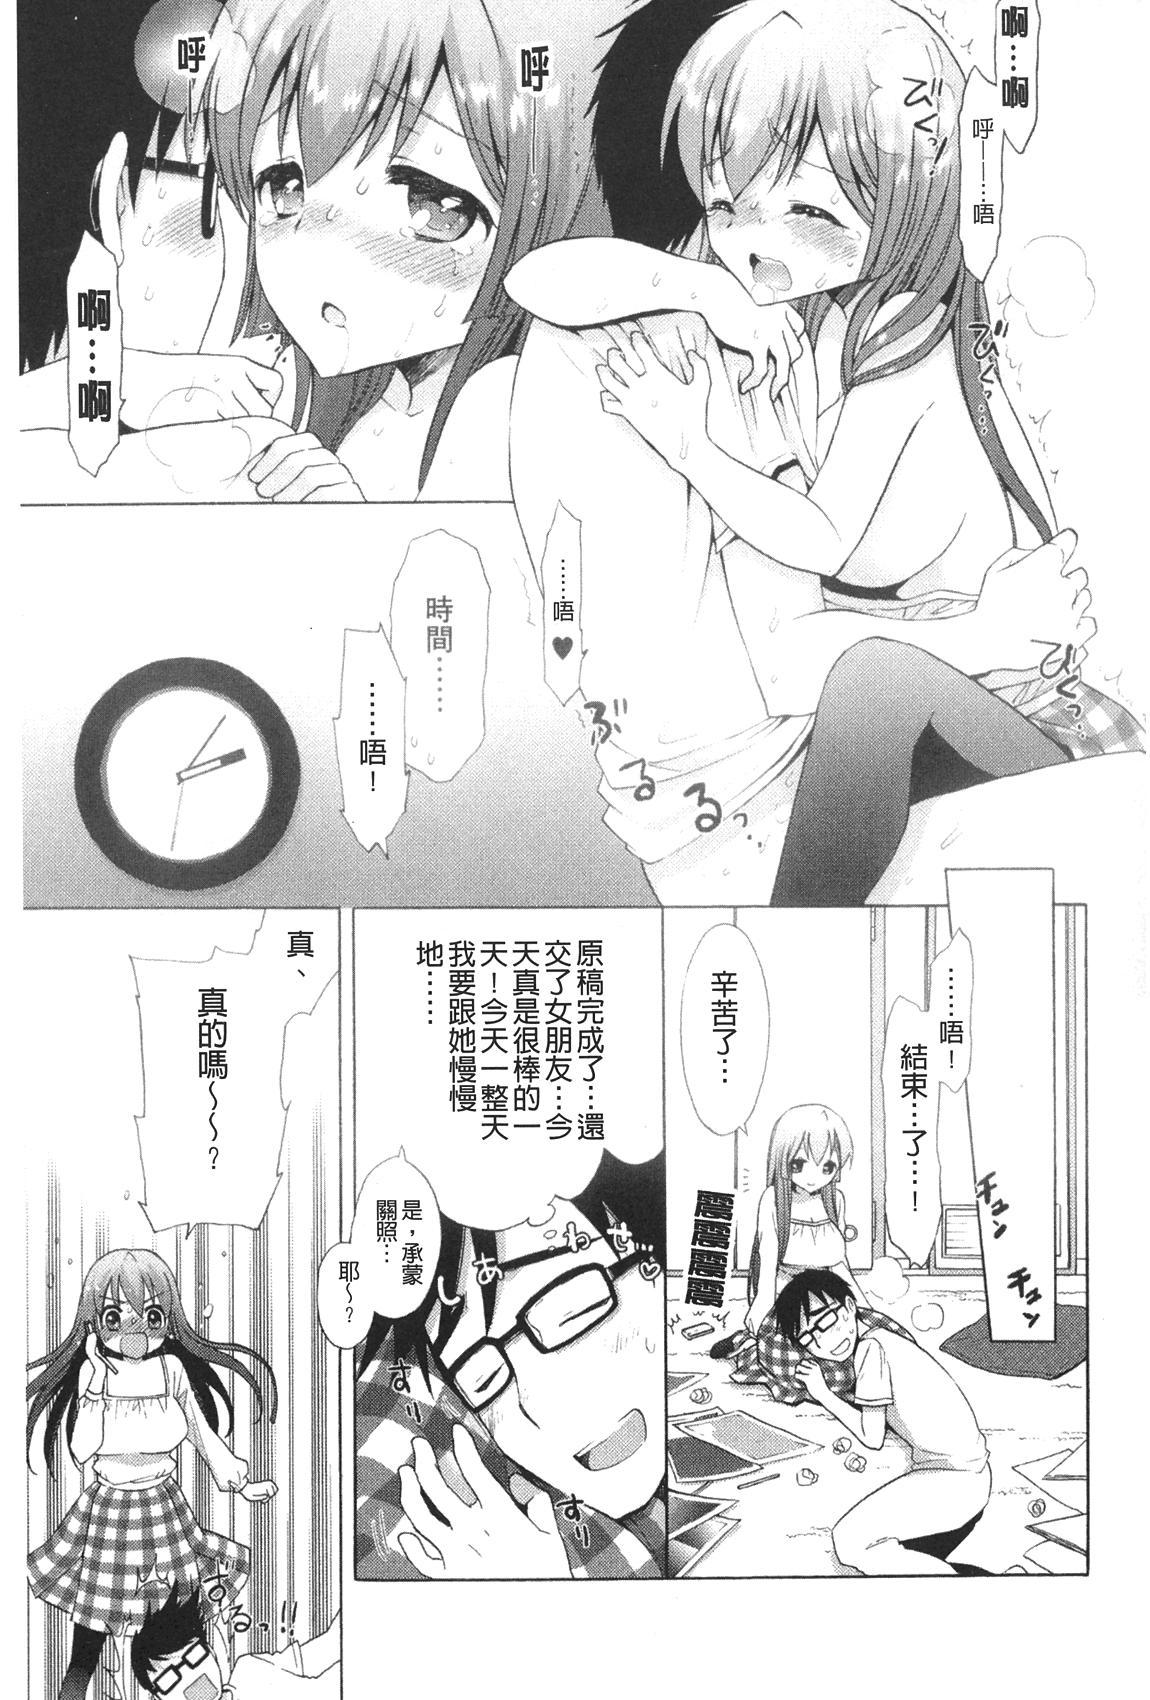 Icha Love! | 稚嫩女之愛! 55